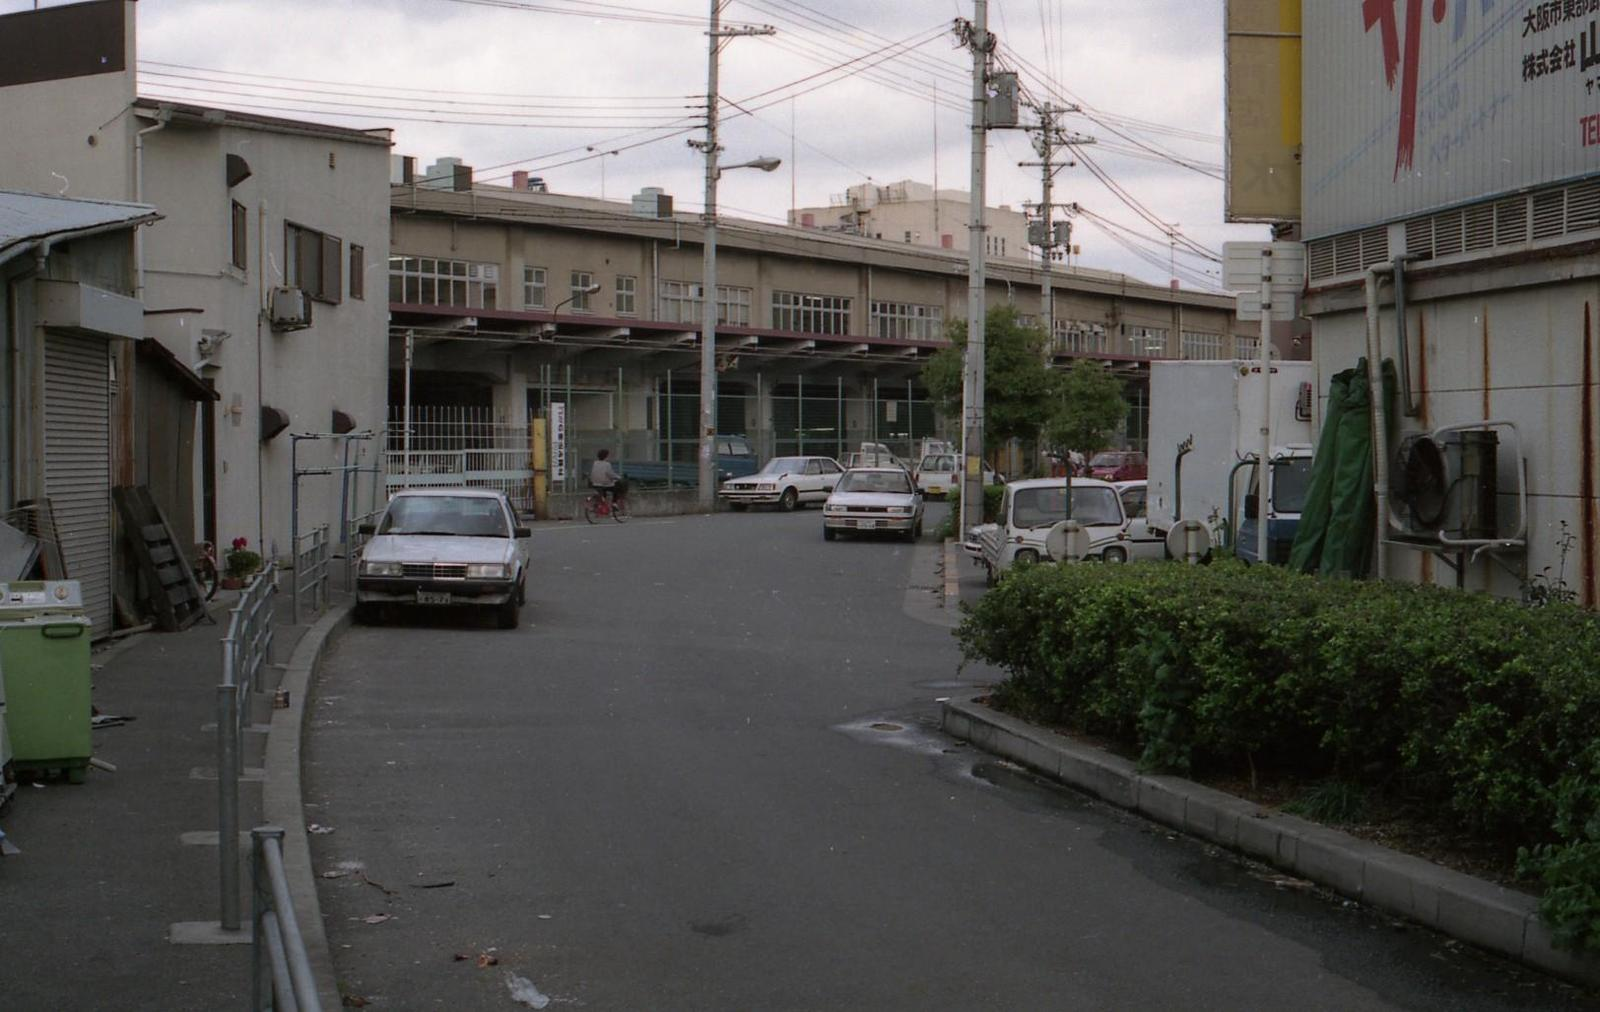 19920411c13